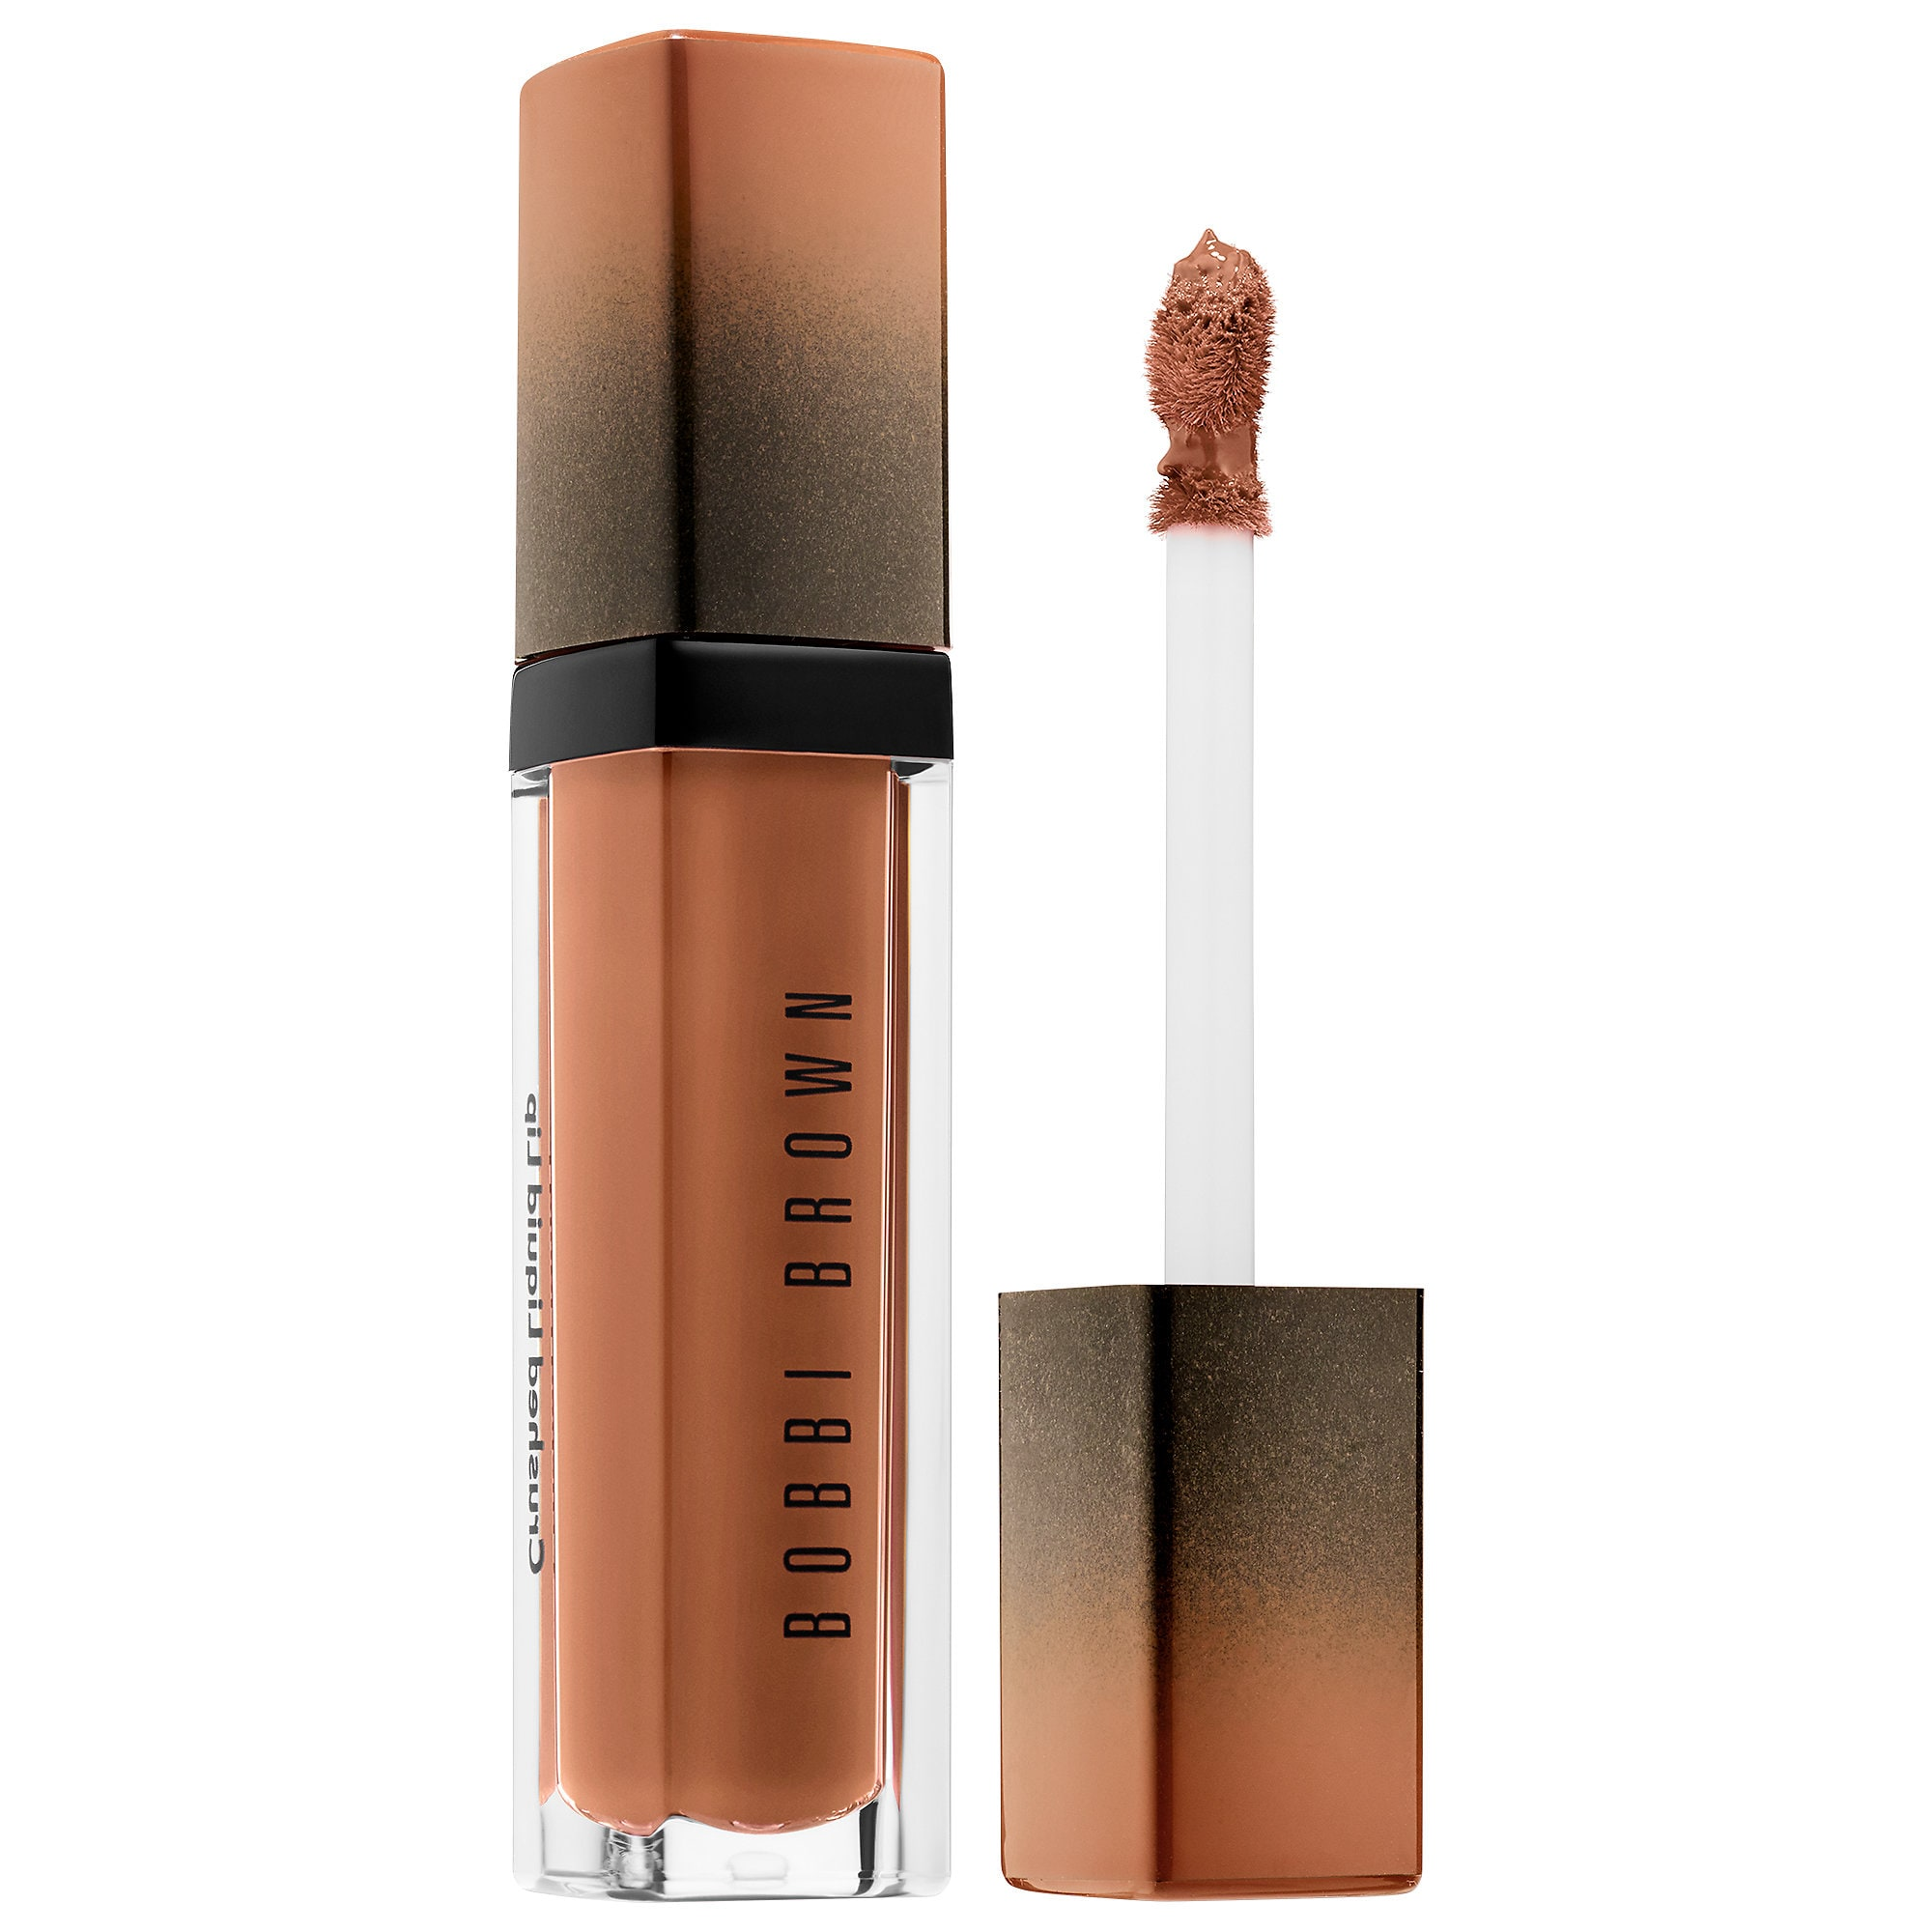 Bobbi Brown - Crushed Liquid Lipstick